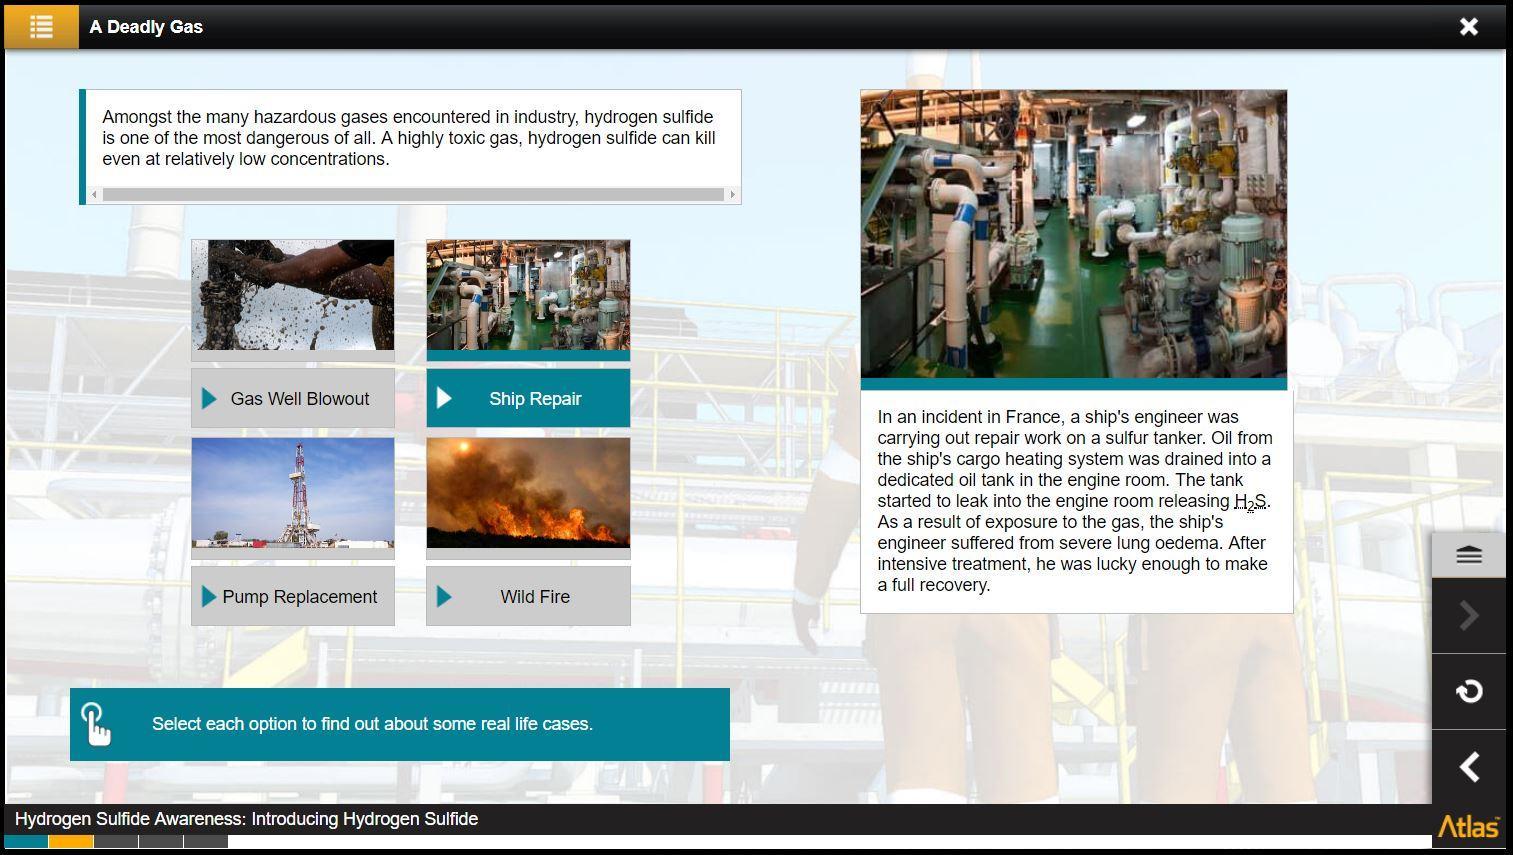 Hydrogen Sulfide Awareness Training 3